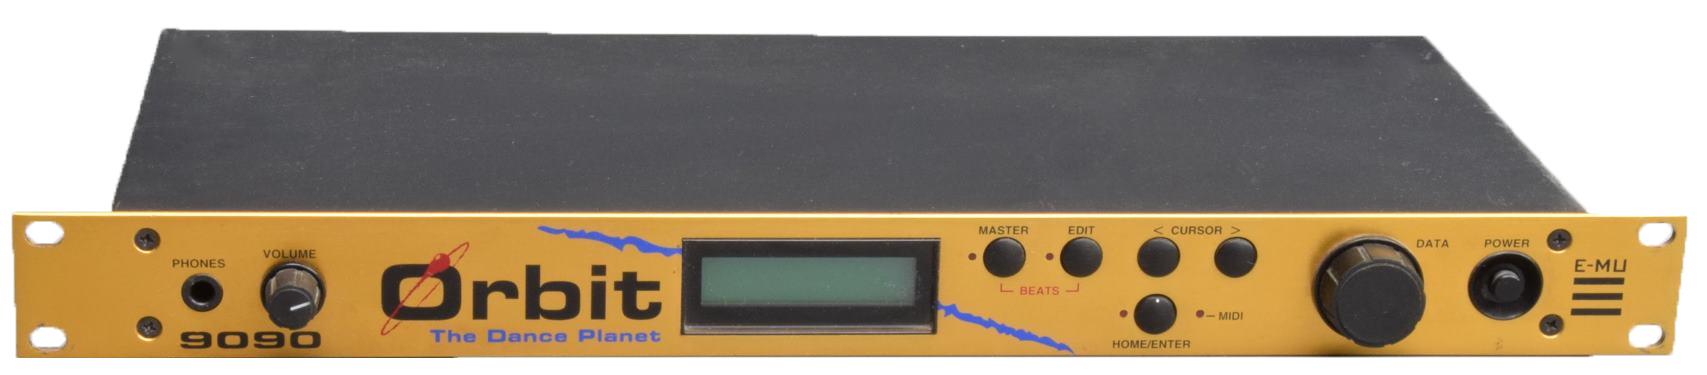 E-MU Orbit 9090